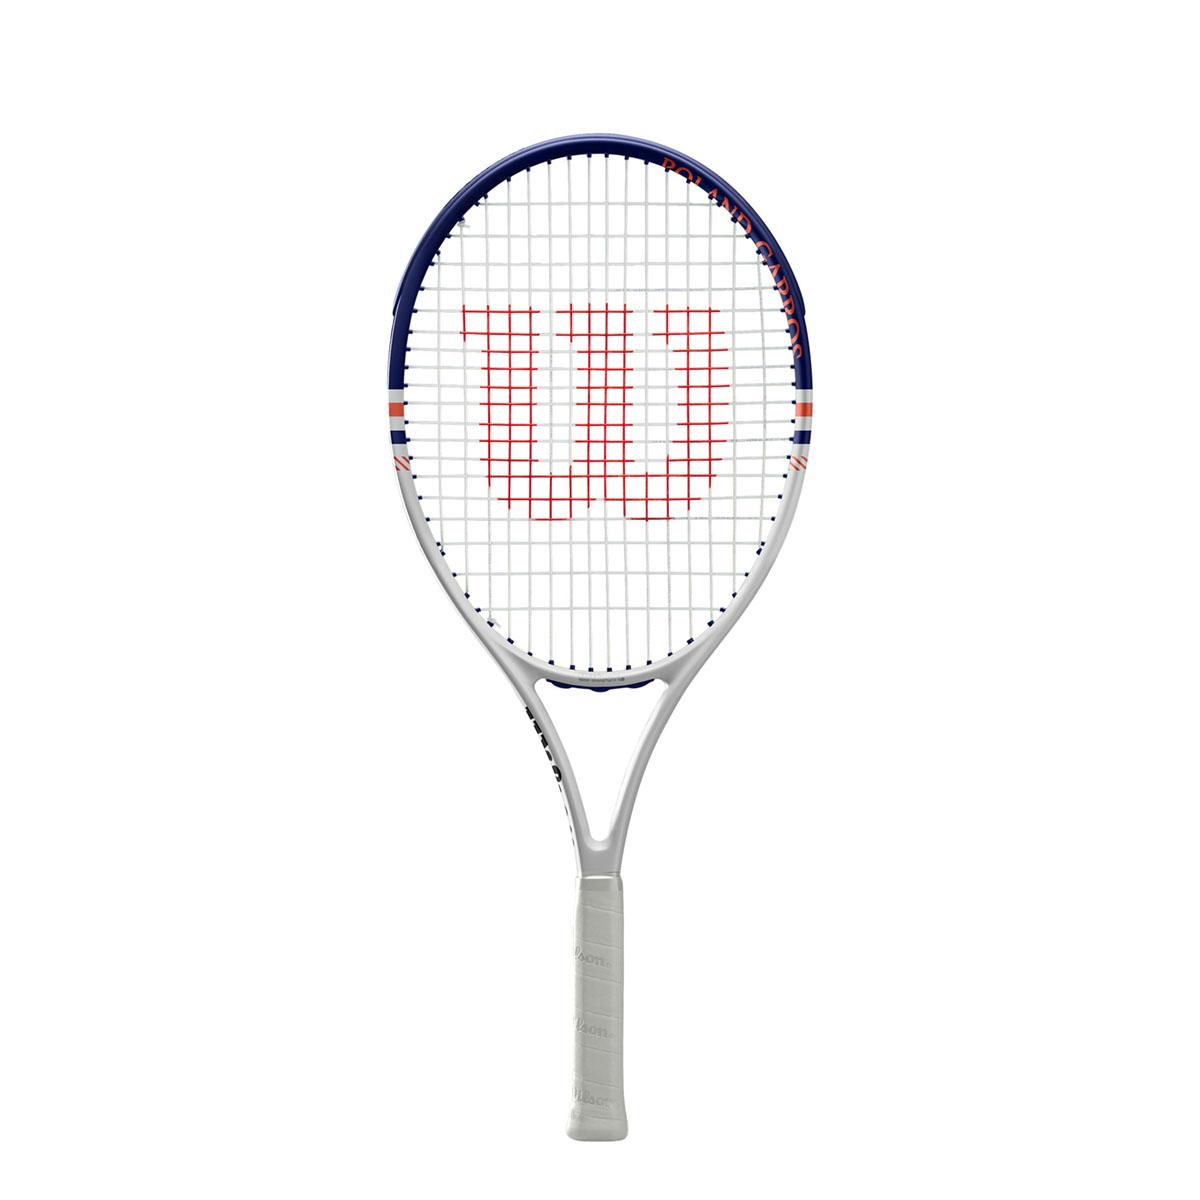 WR070210H_0_Roland_Garros_Elite_Competition_JR_BU_OR_WH.png.cq5dam.web.2000.2000